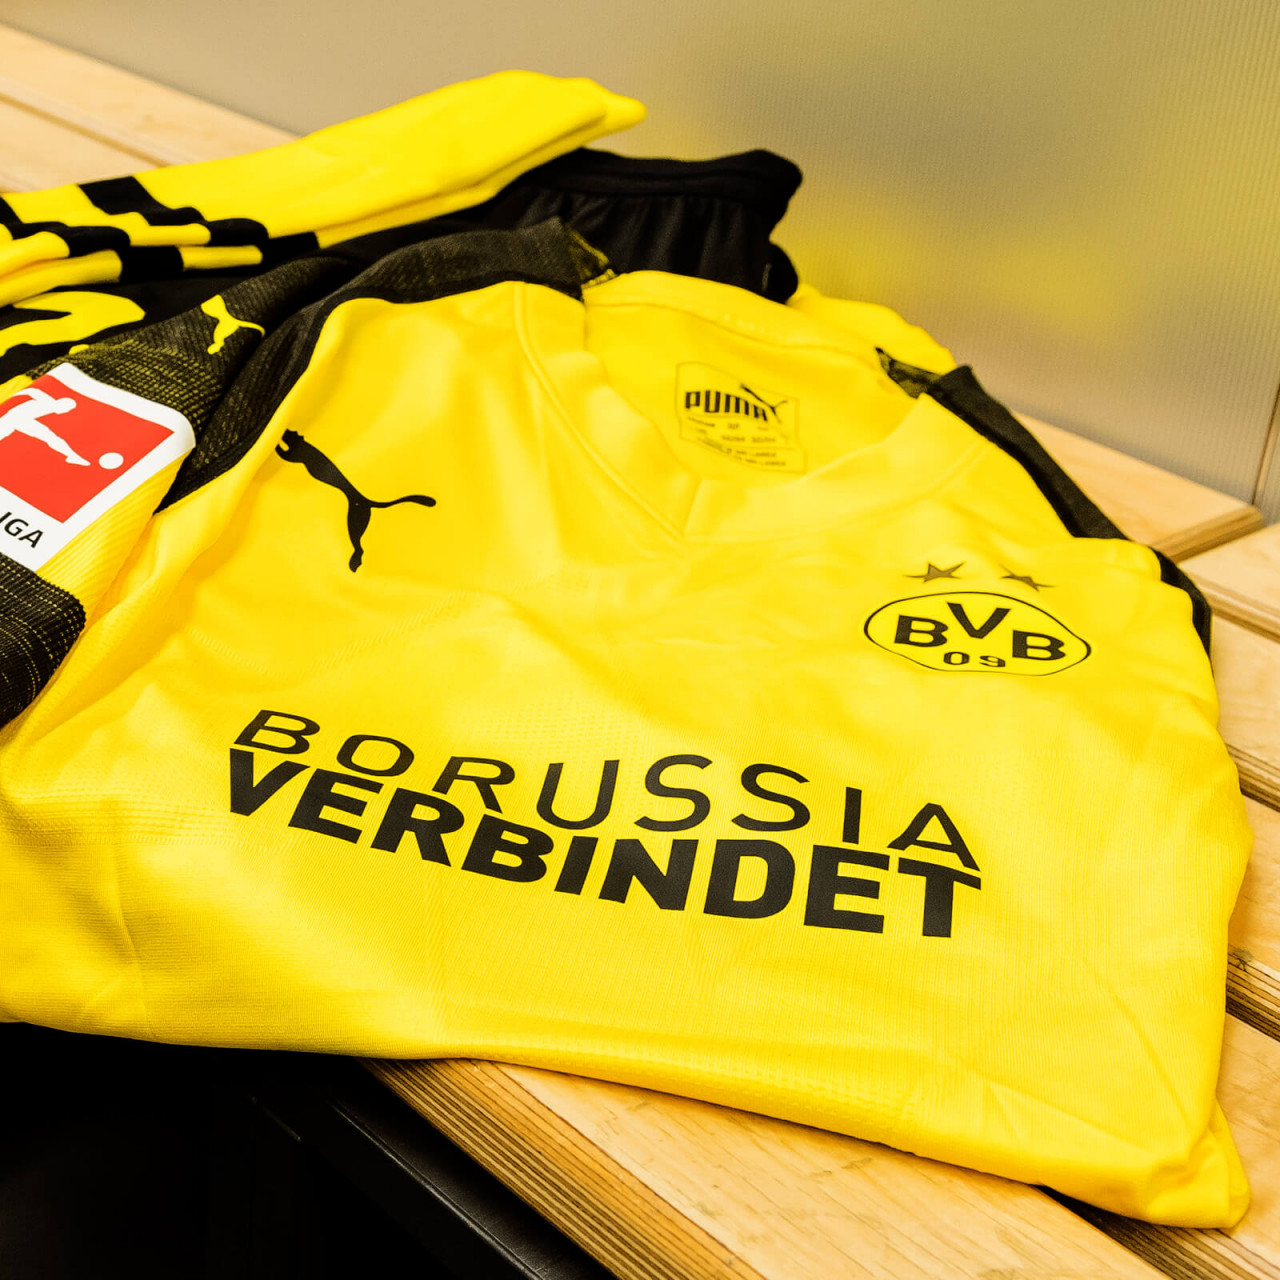 "Vorber. Trikot Hakimi, ""Borussia verbindet´´"